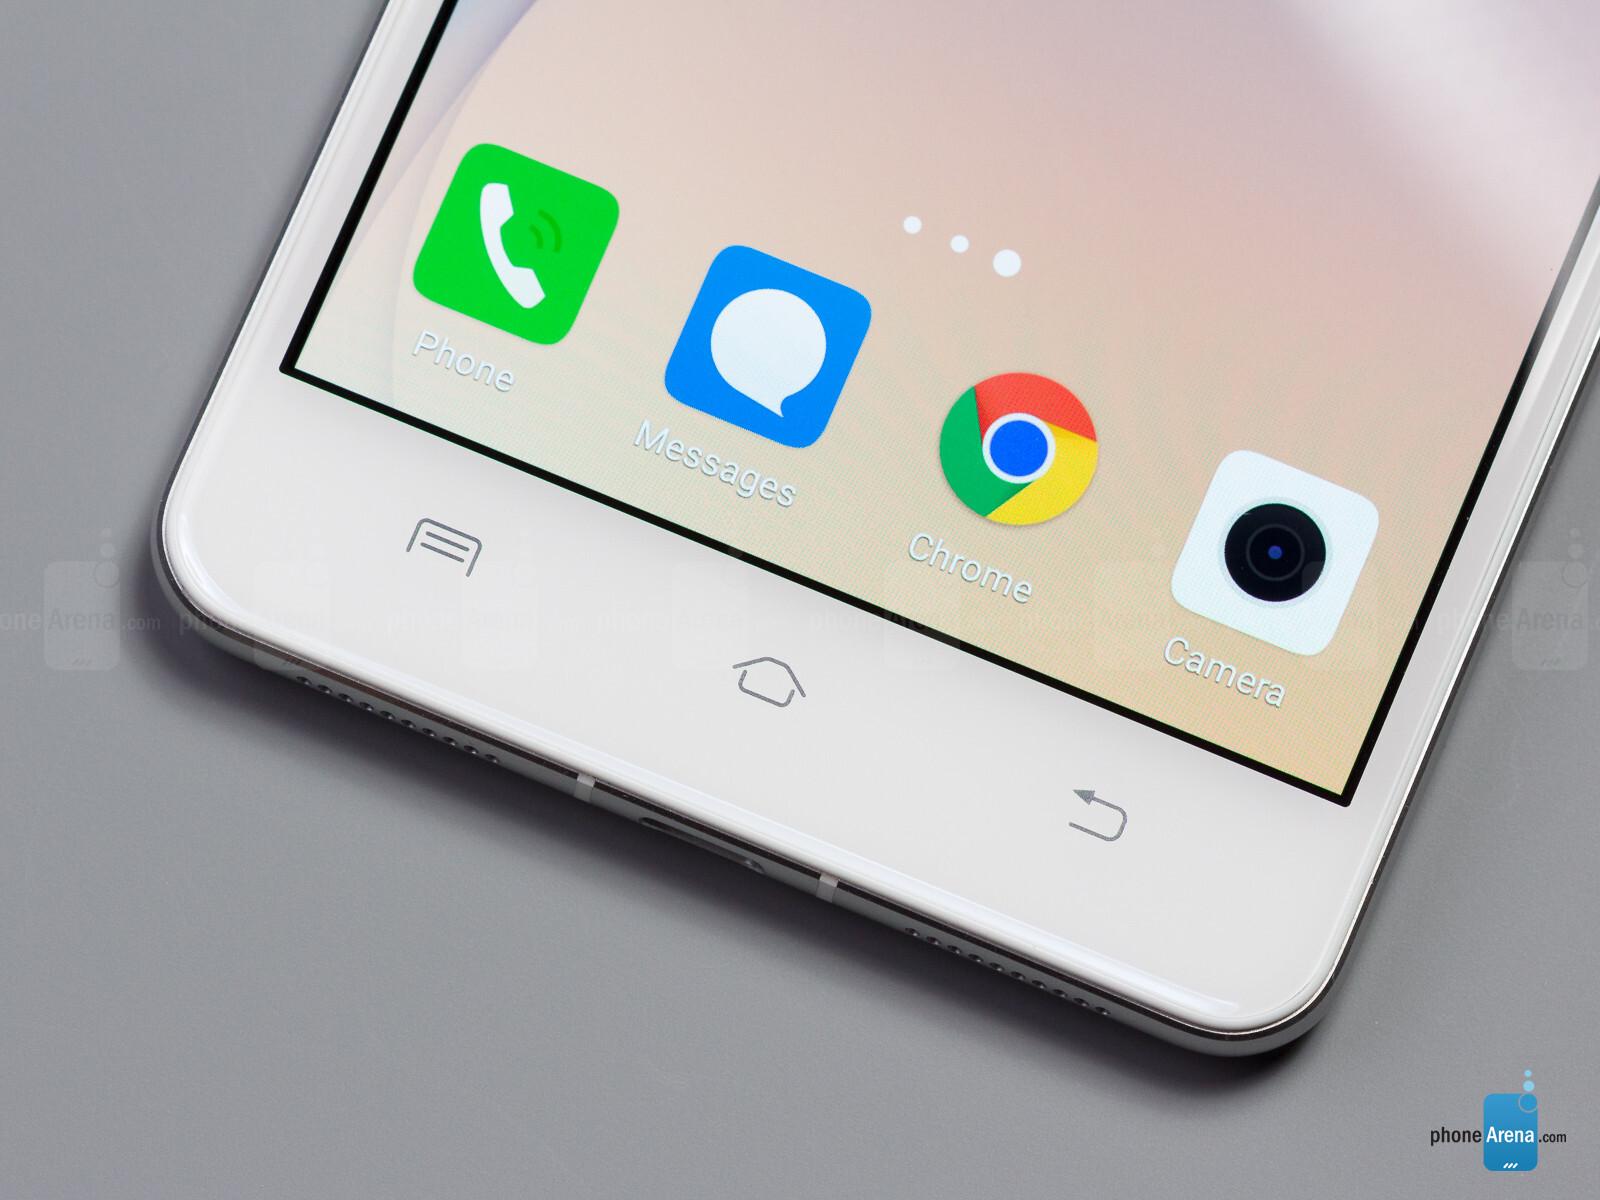 Vivo X5Pro Review: A stylish sleek flagship smartphone